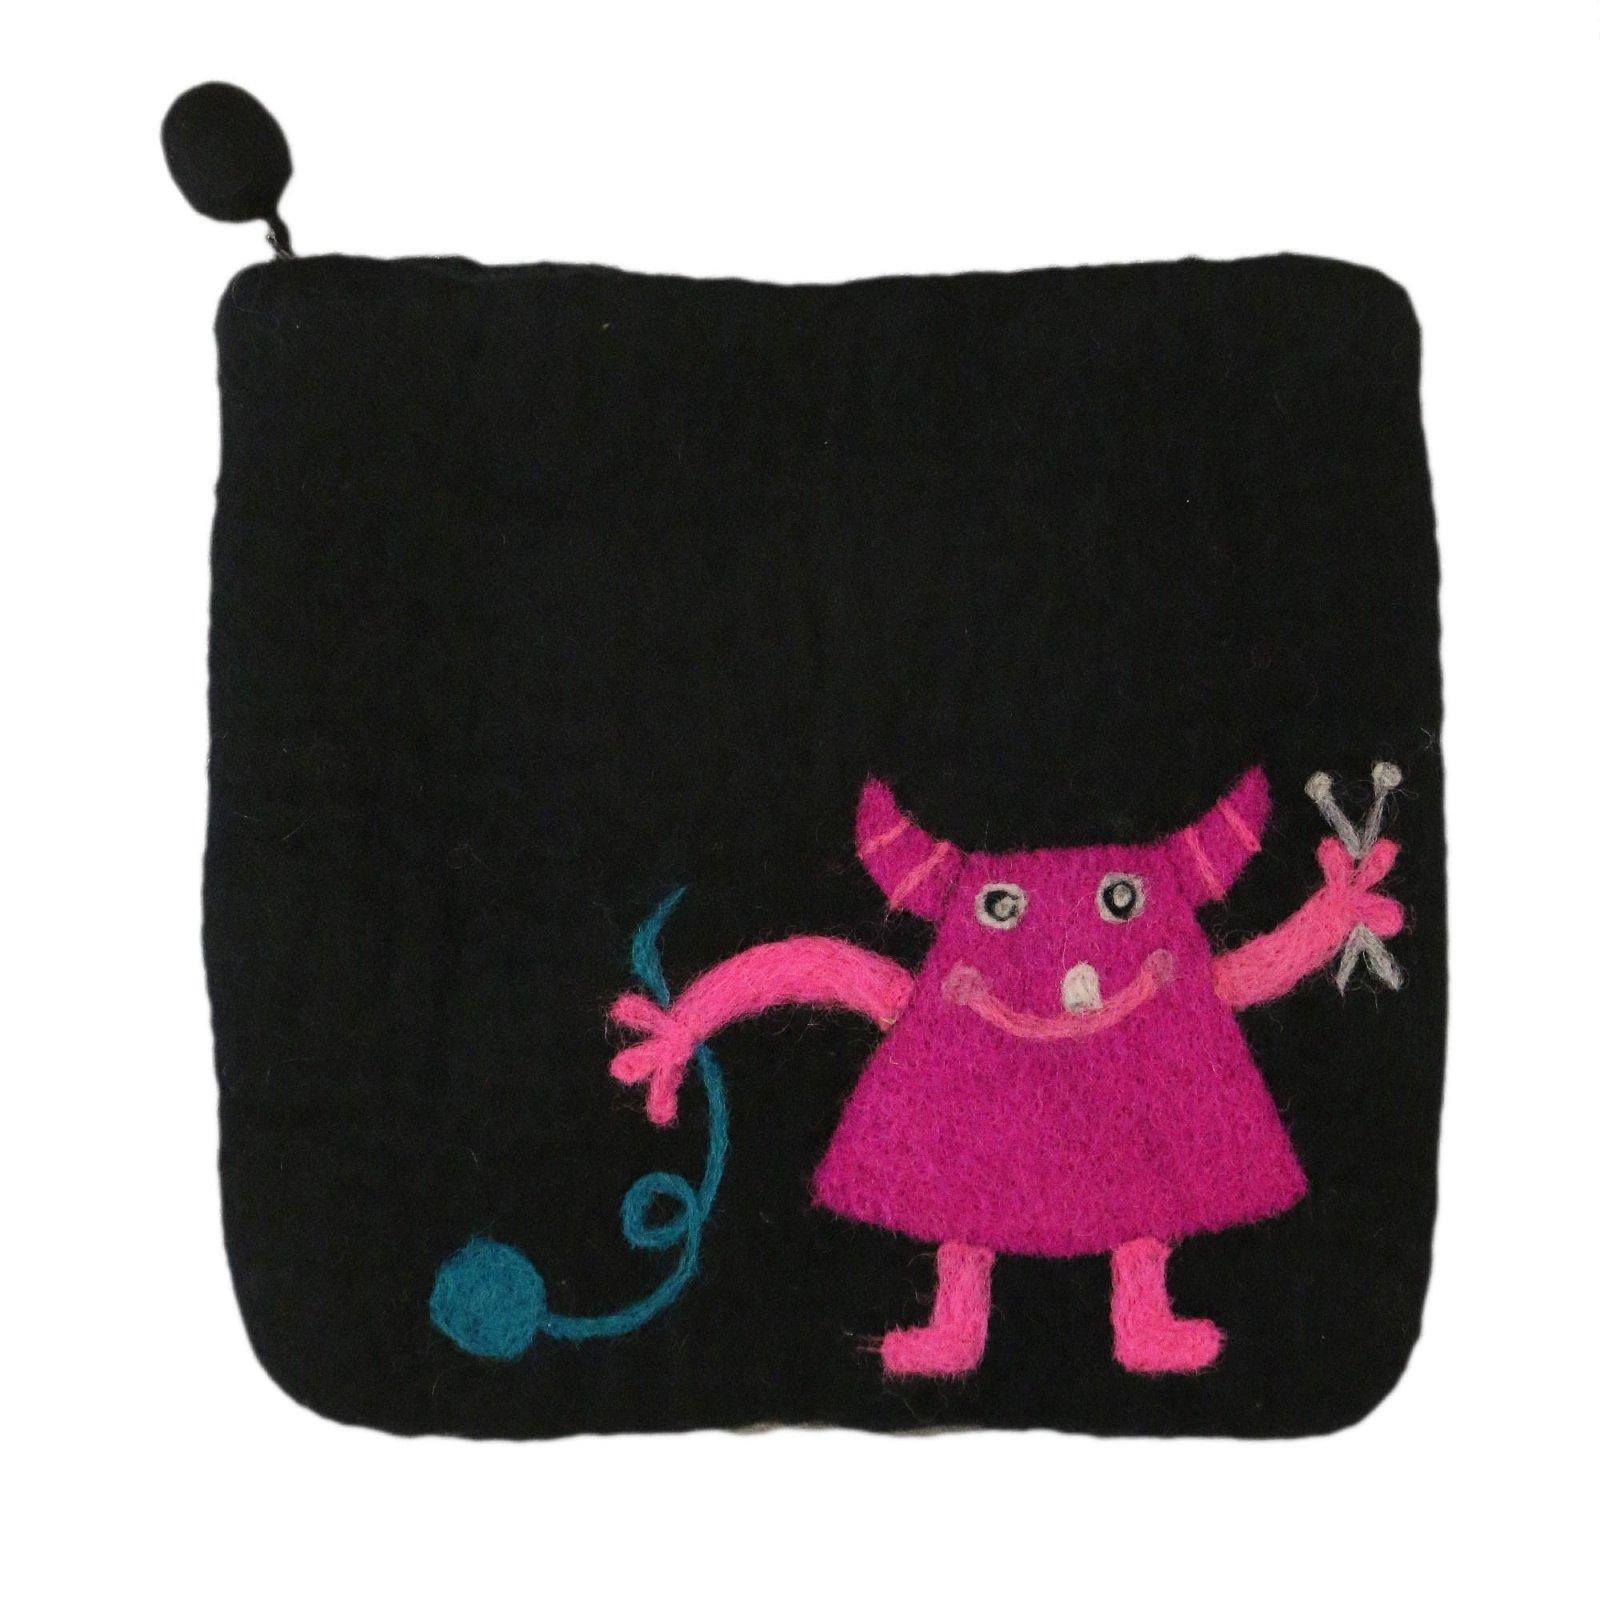 Frabjous Fibers Baby Knitting Fiend Felted Bag